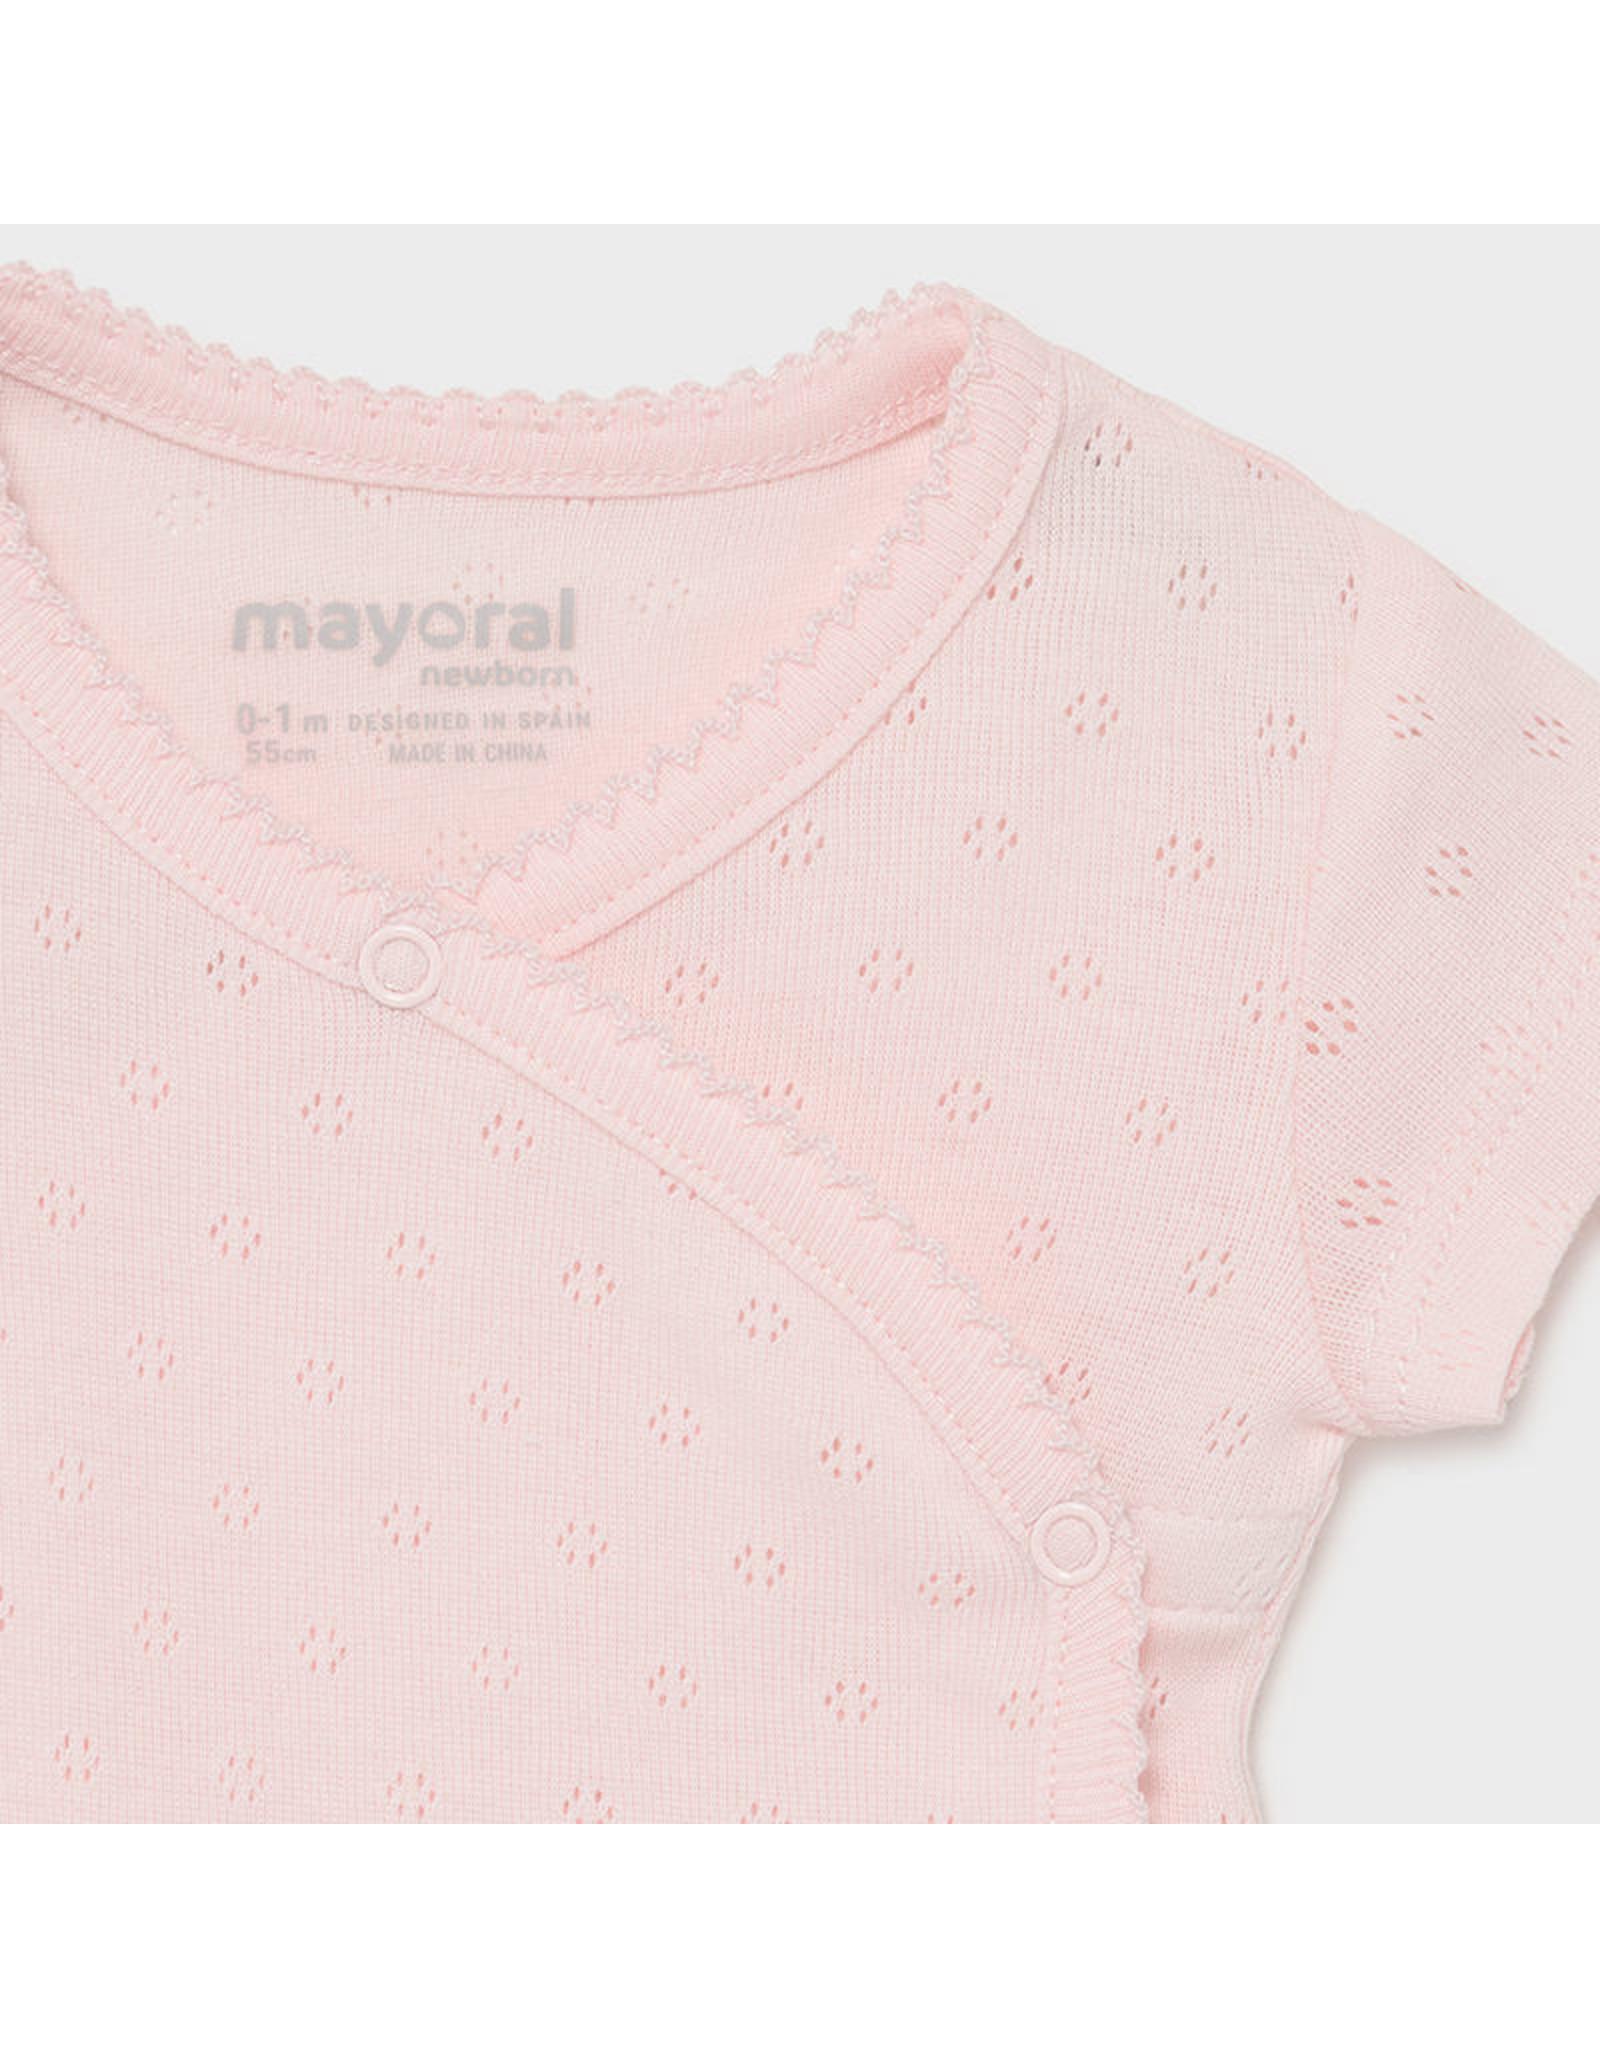 Mayoral S/s basic body Baby Rose